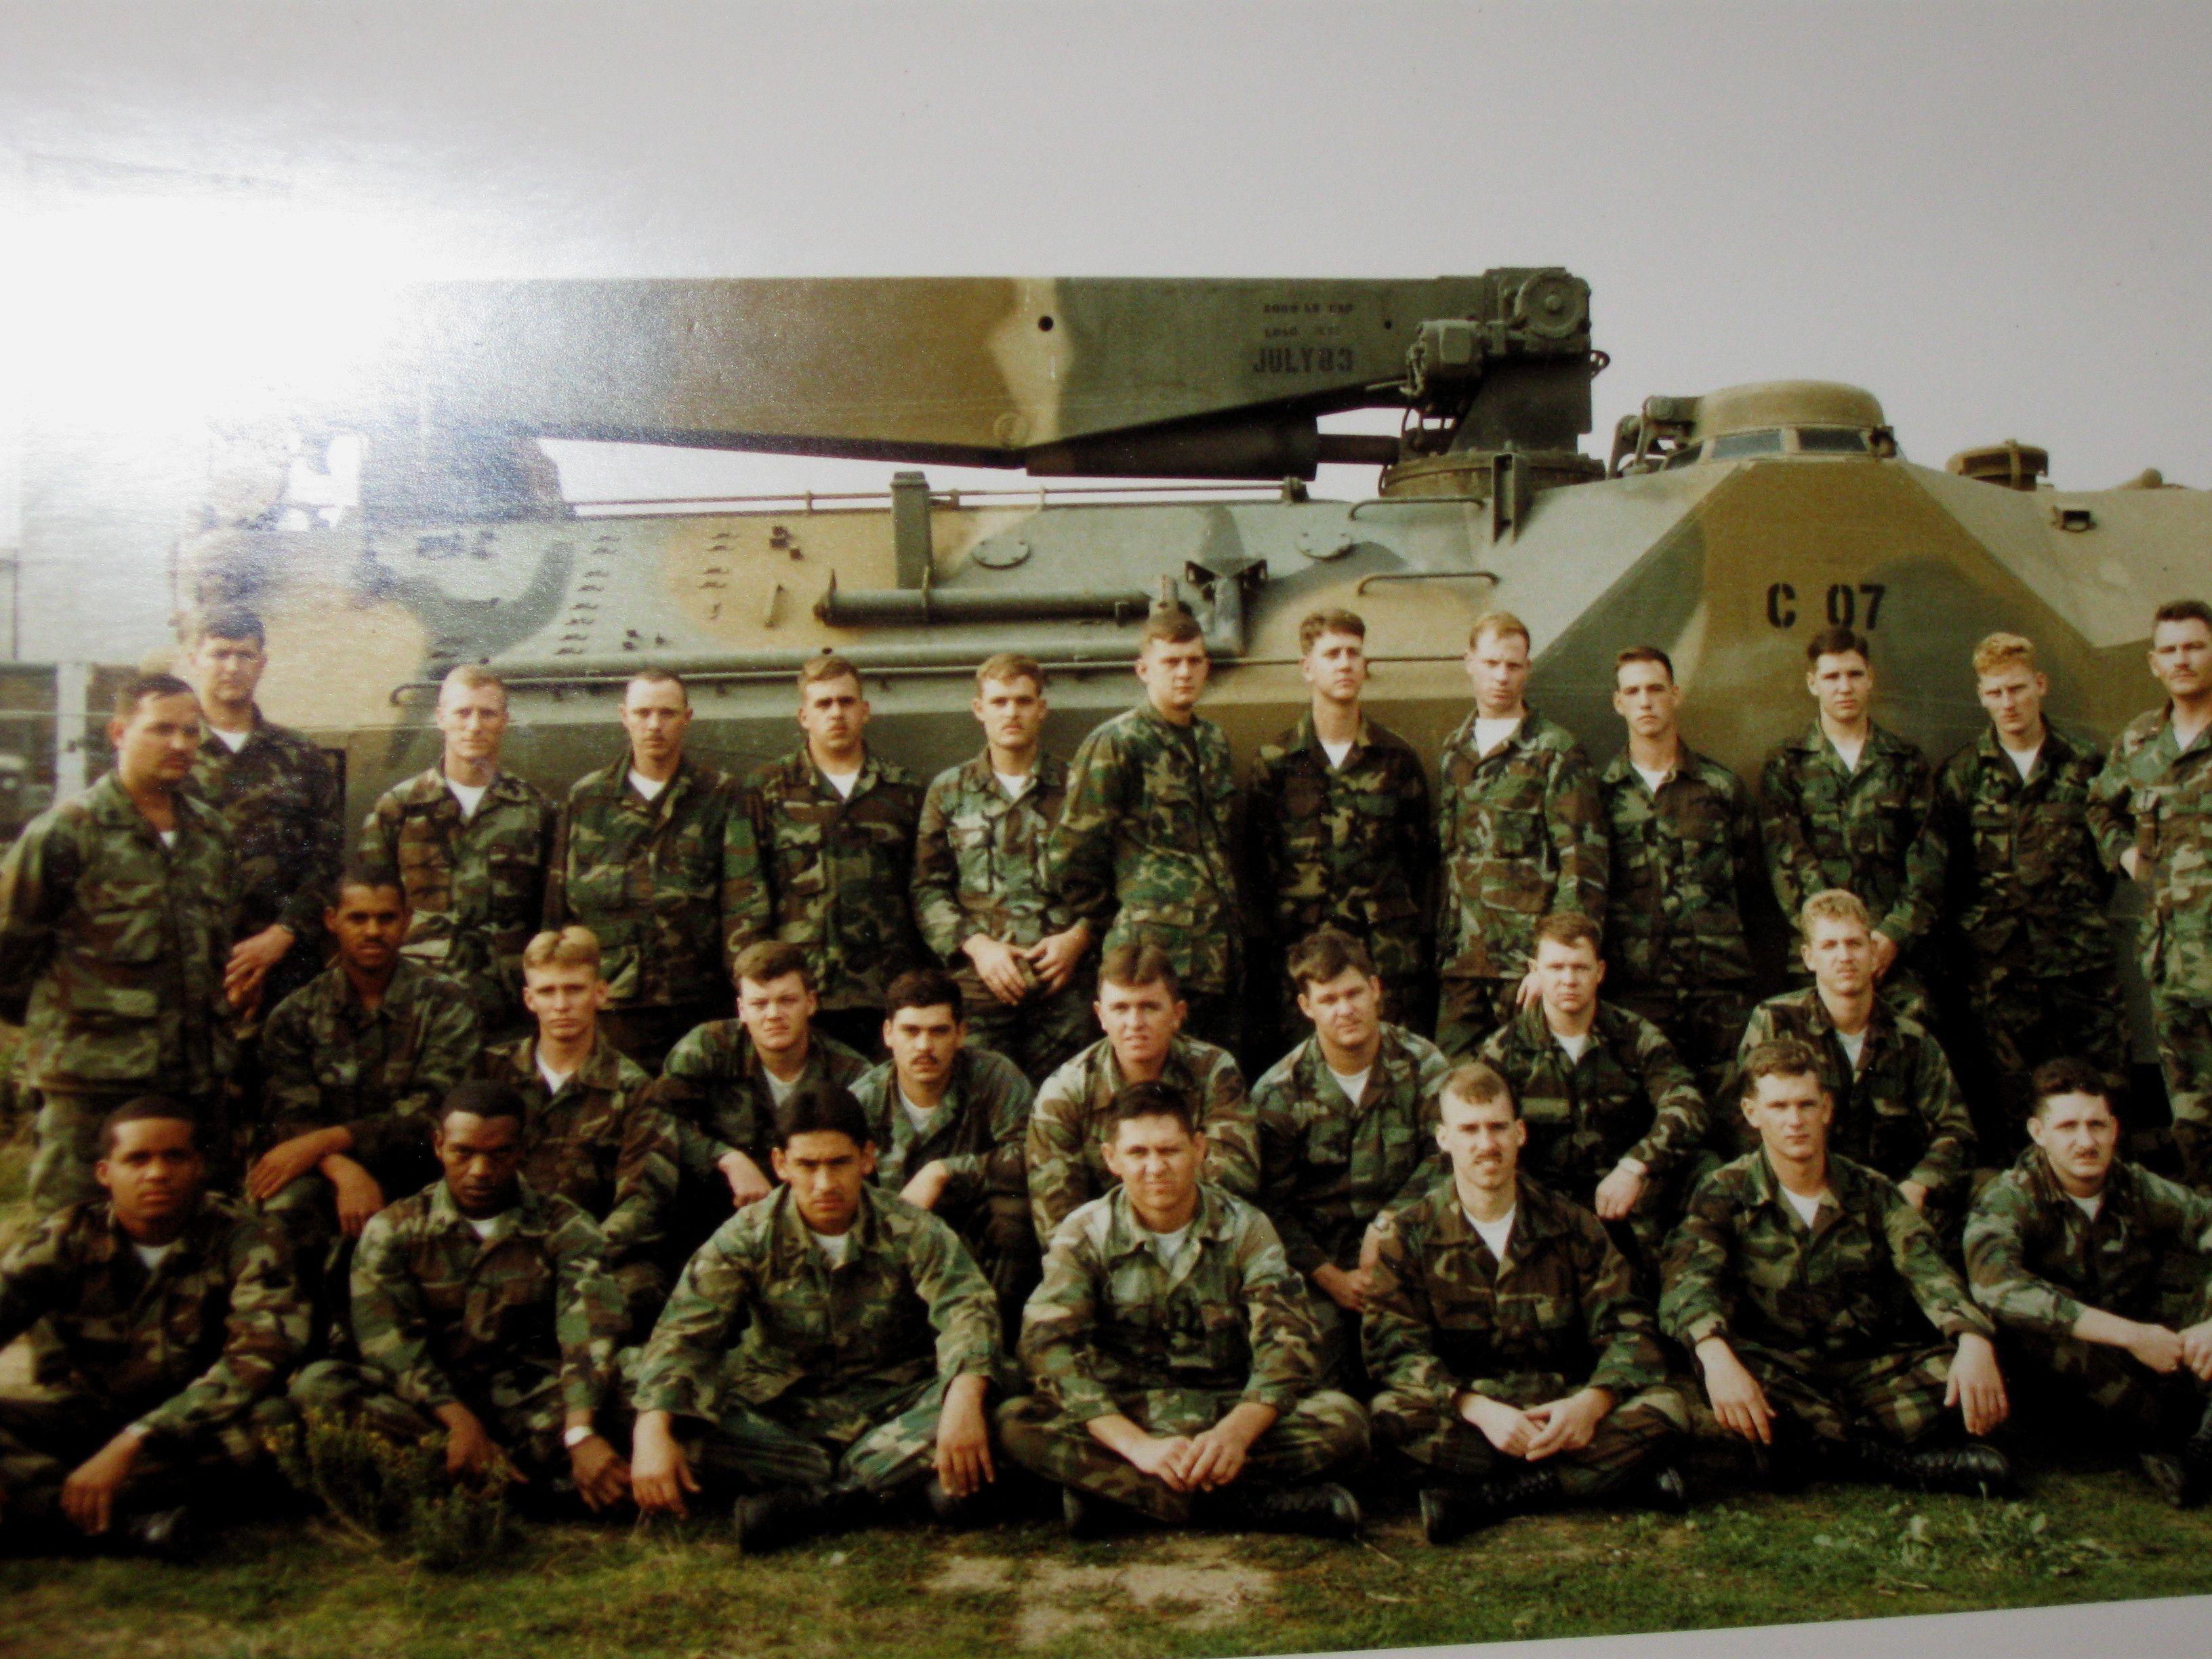 Charlie Company Maintenance Plt 3rd Aav Bn 1st Marine Division